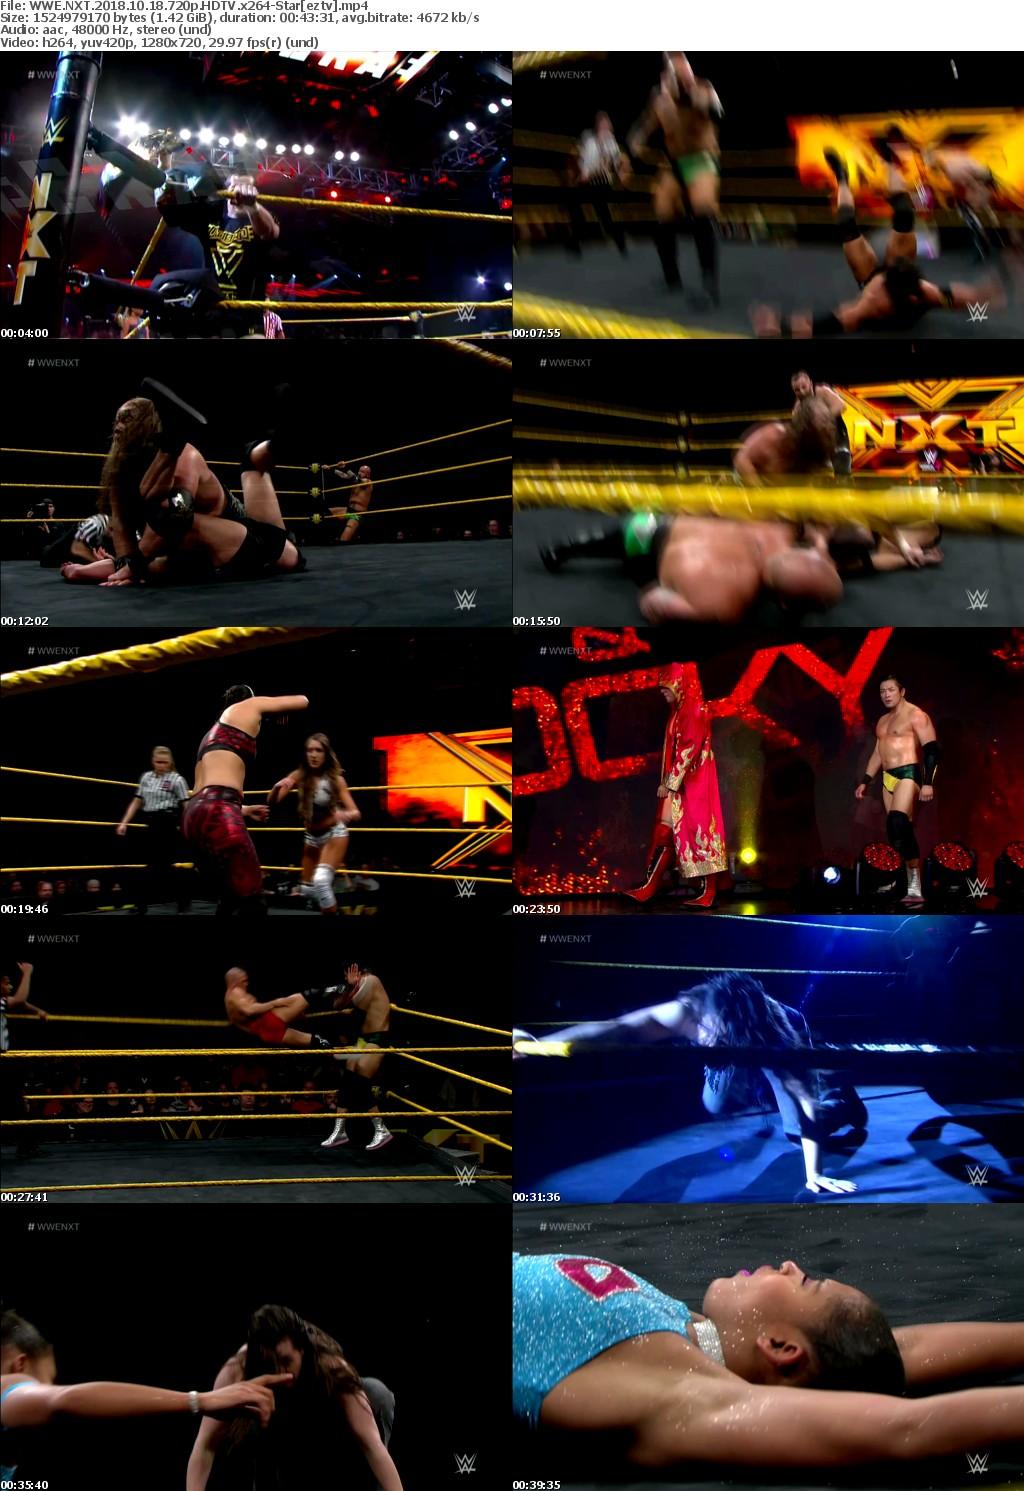 WWE NXT (2018) 10 18 720p HDTV x264-Star